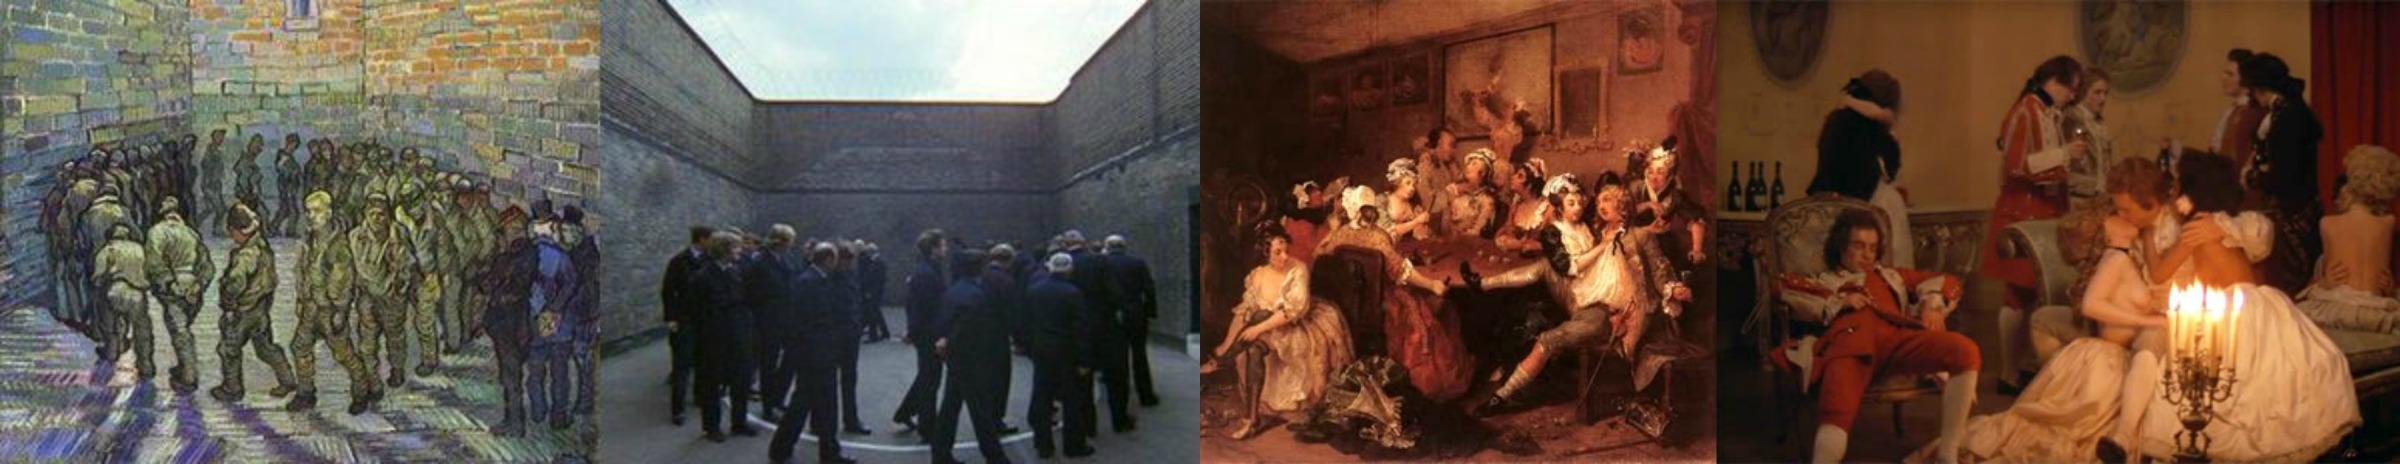 Le inquadrature Kubrickiane ispirate ai dipinti (e non solo)